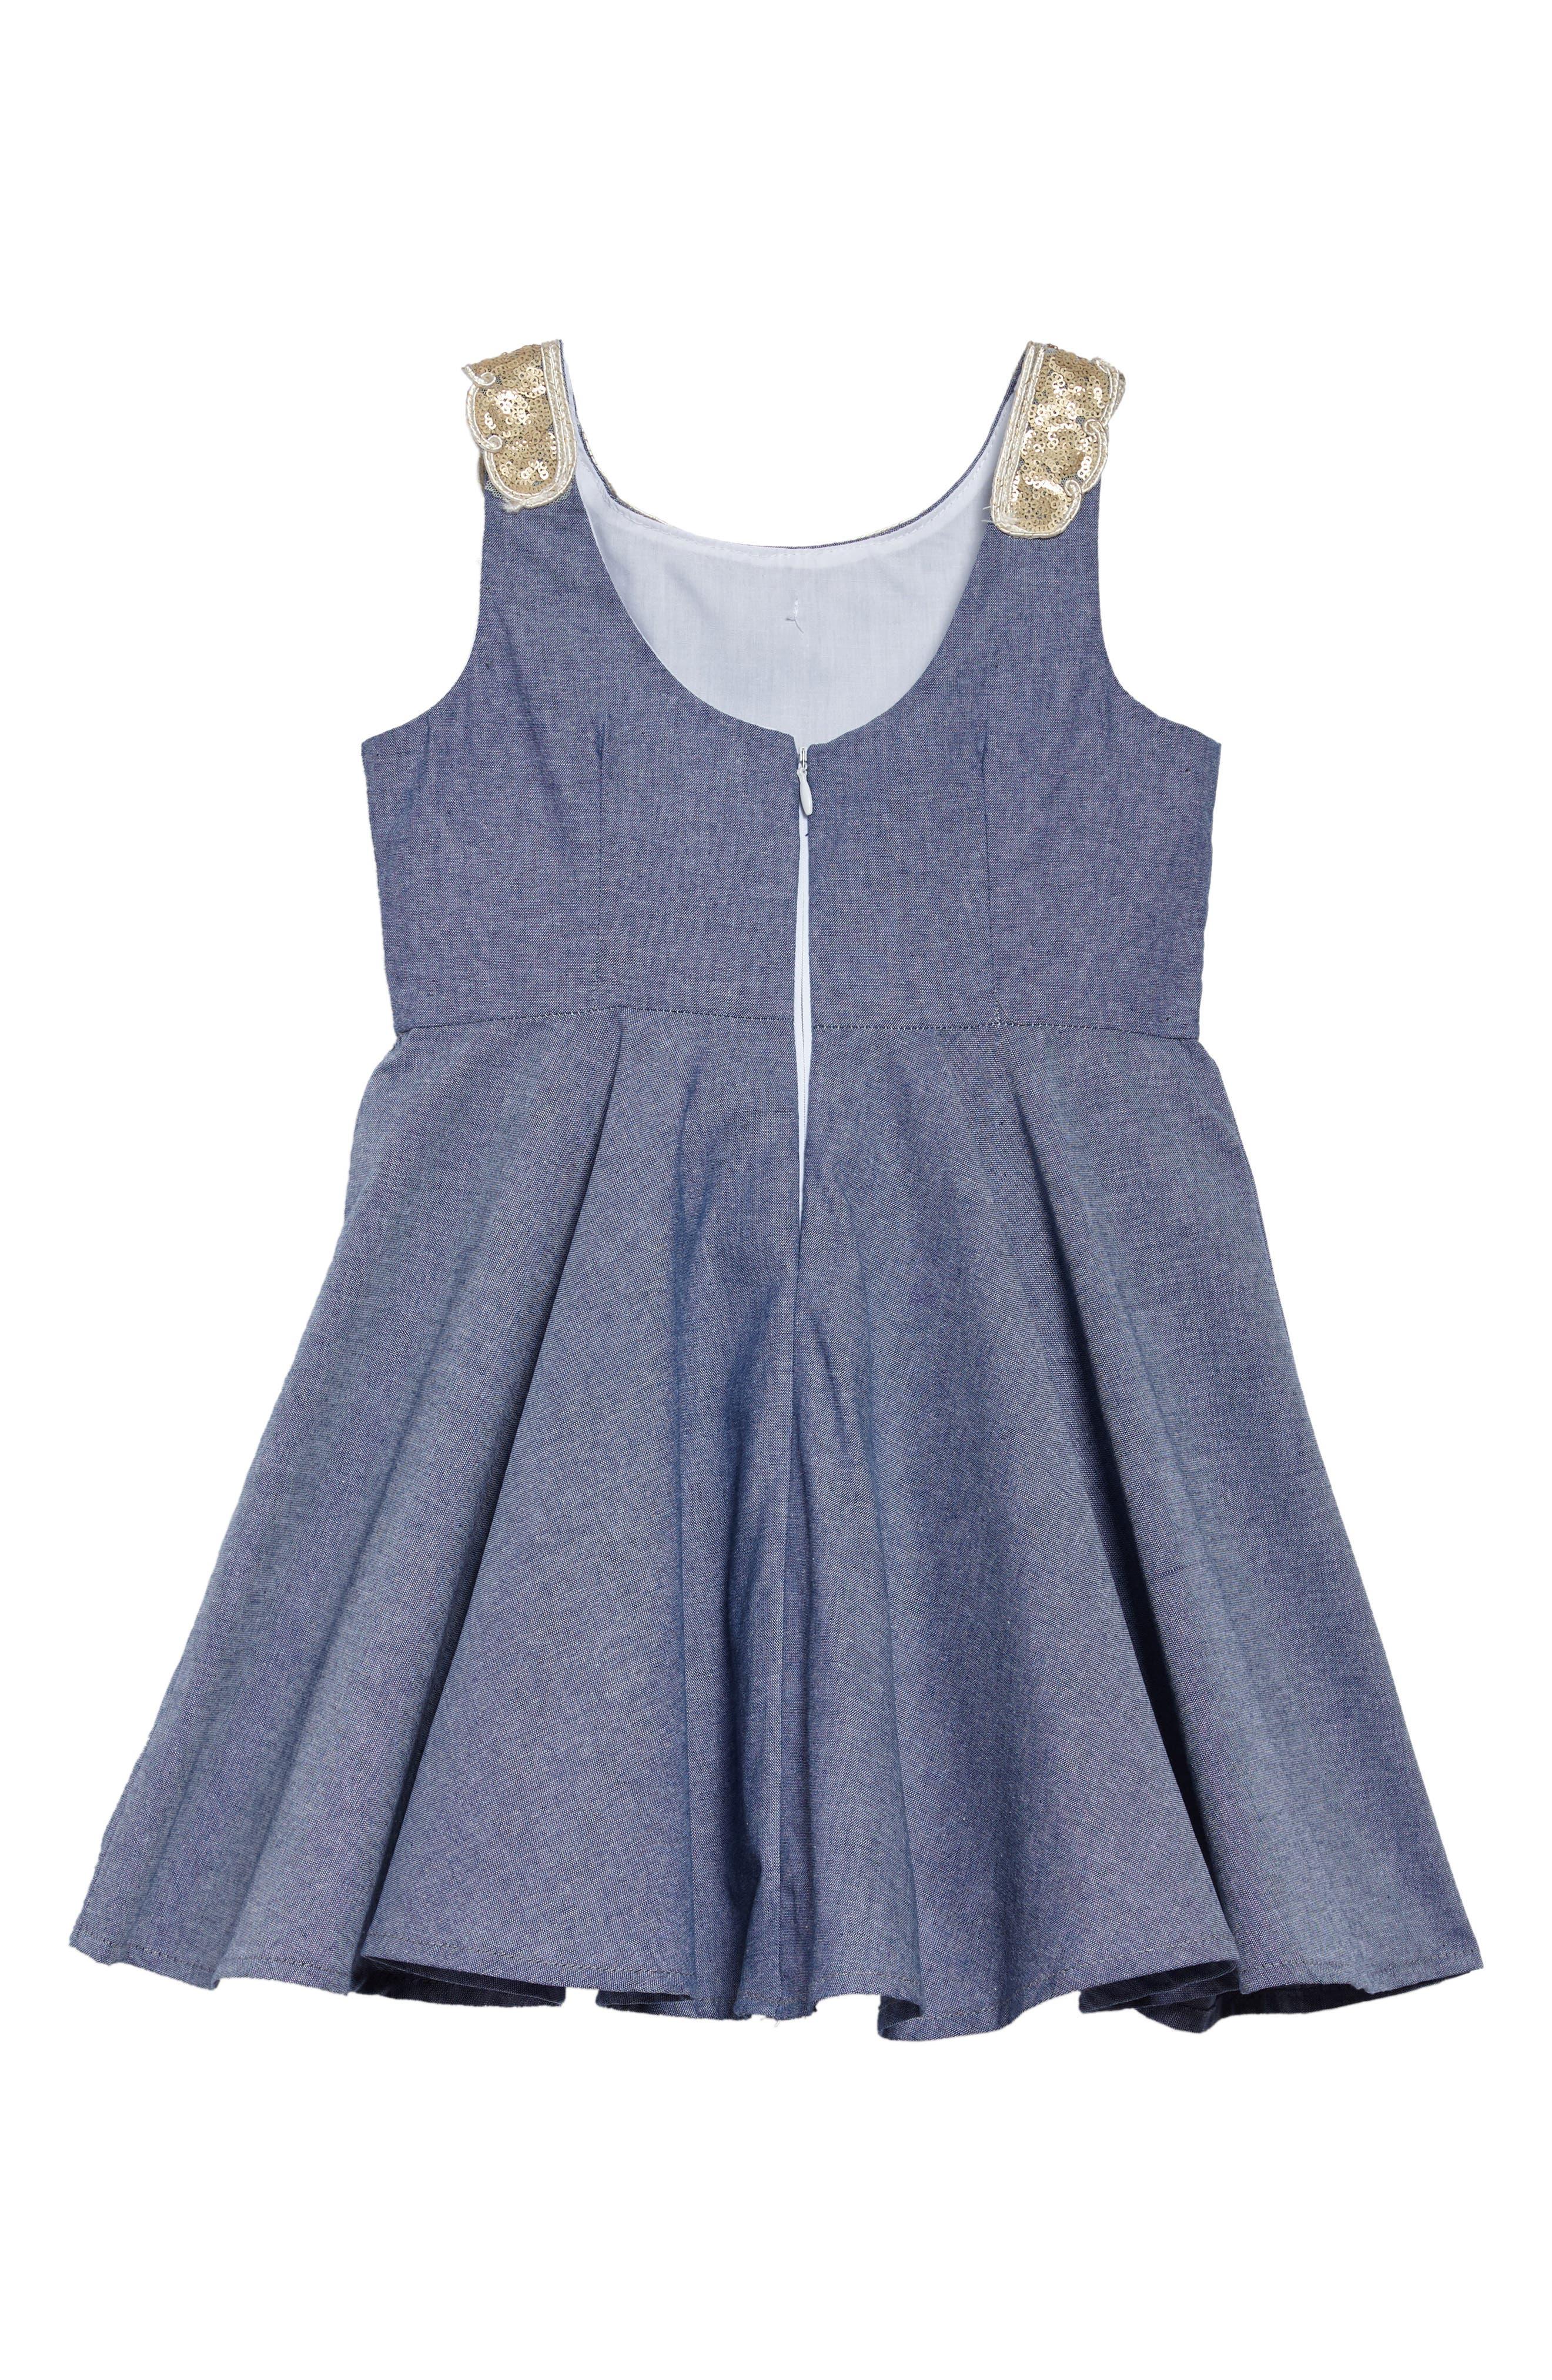 Alternate Image 2  - Fiveloaves Twofish Darcy Chambray Dress (Toddler Girls, Little Girls & Big Girls)